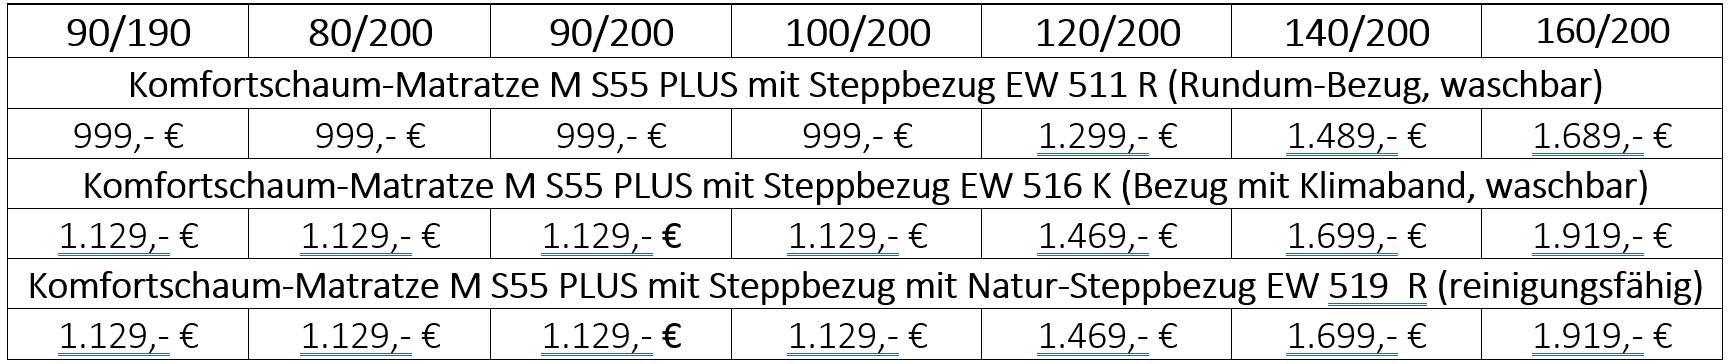 Werkmeister S70 Plus Preistabelle